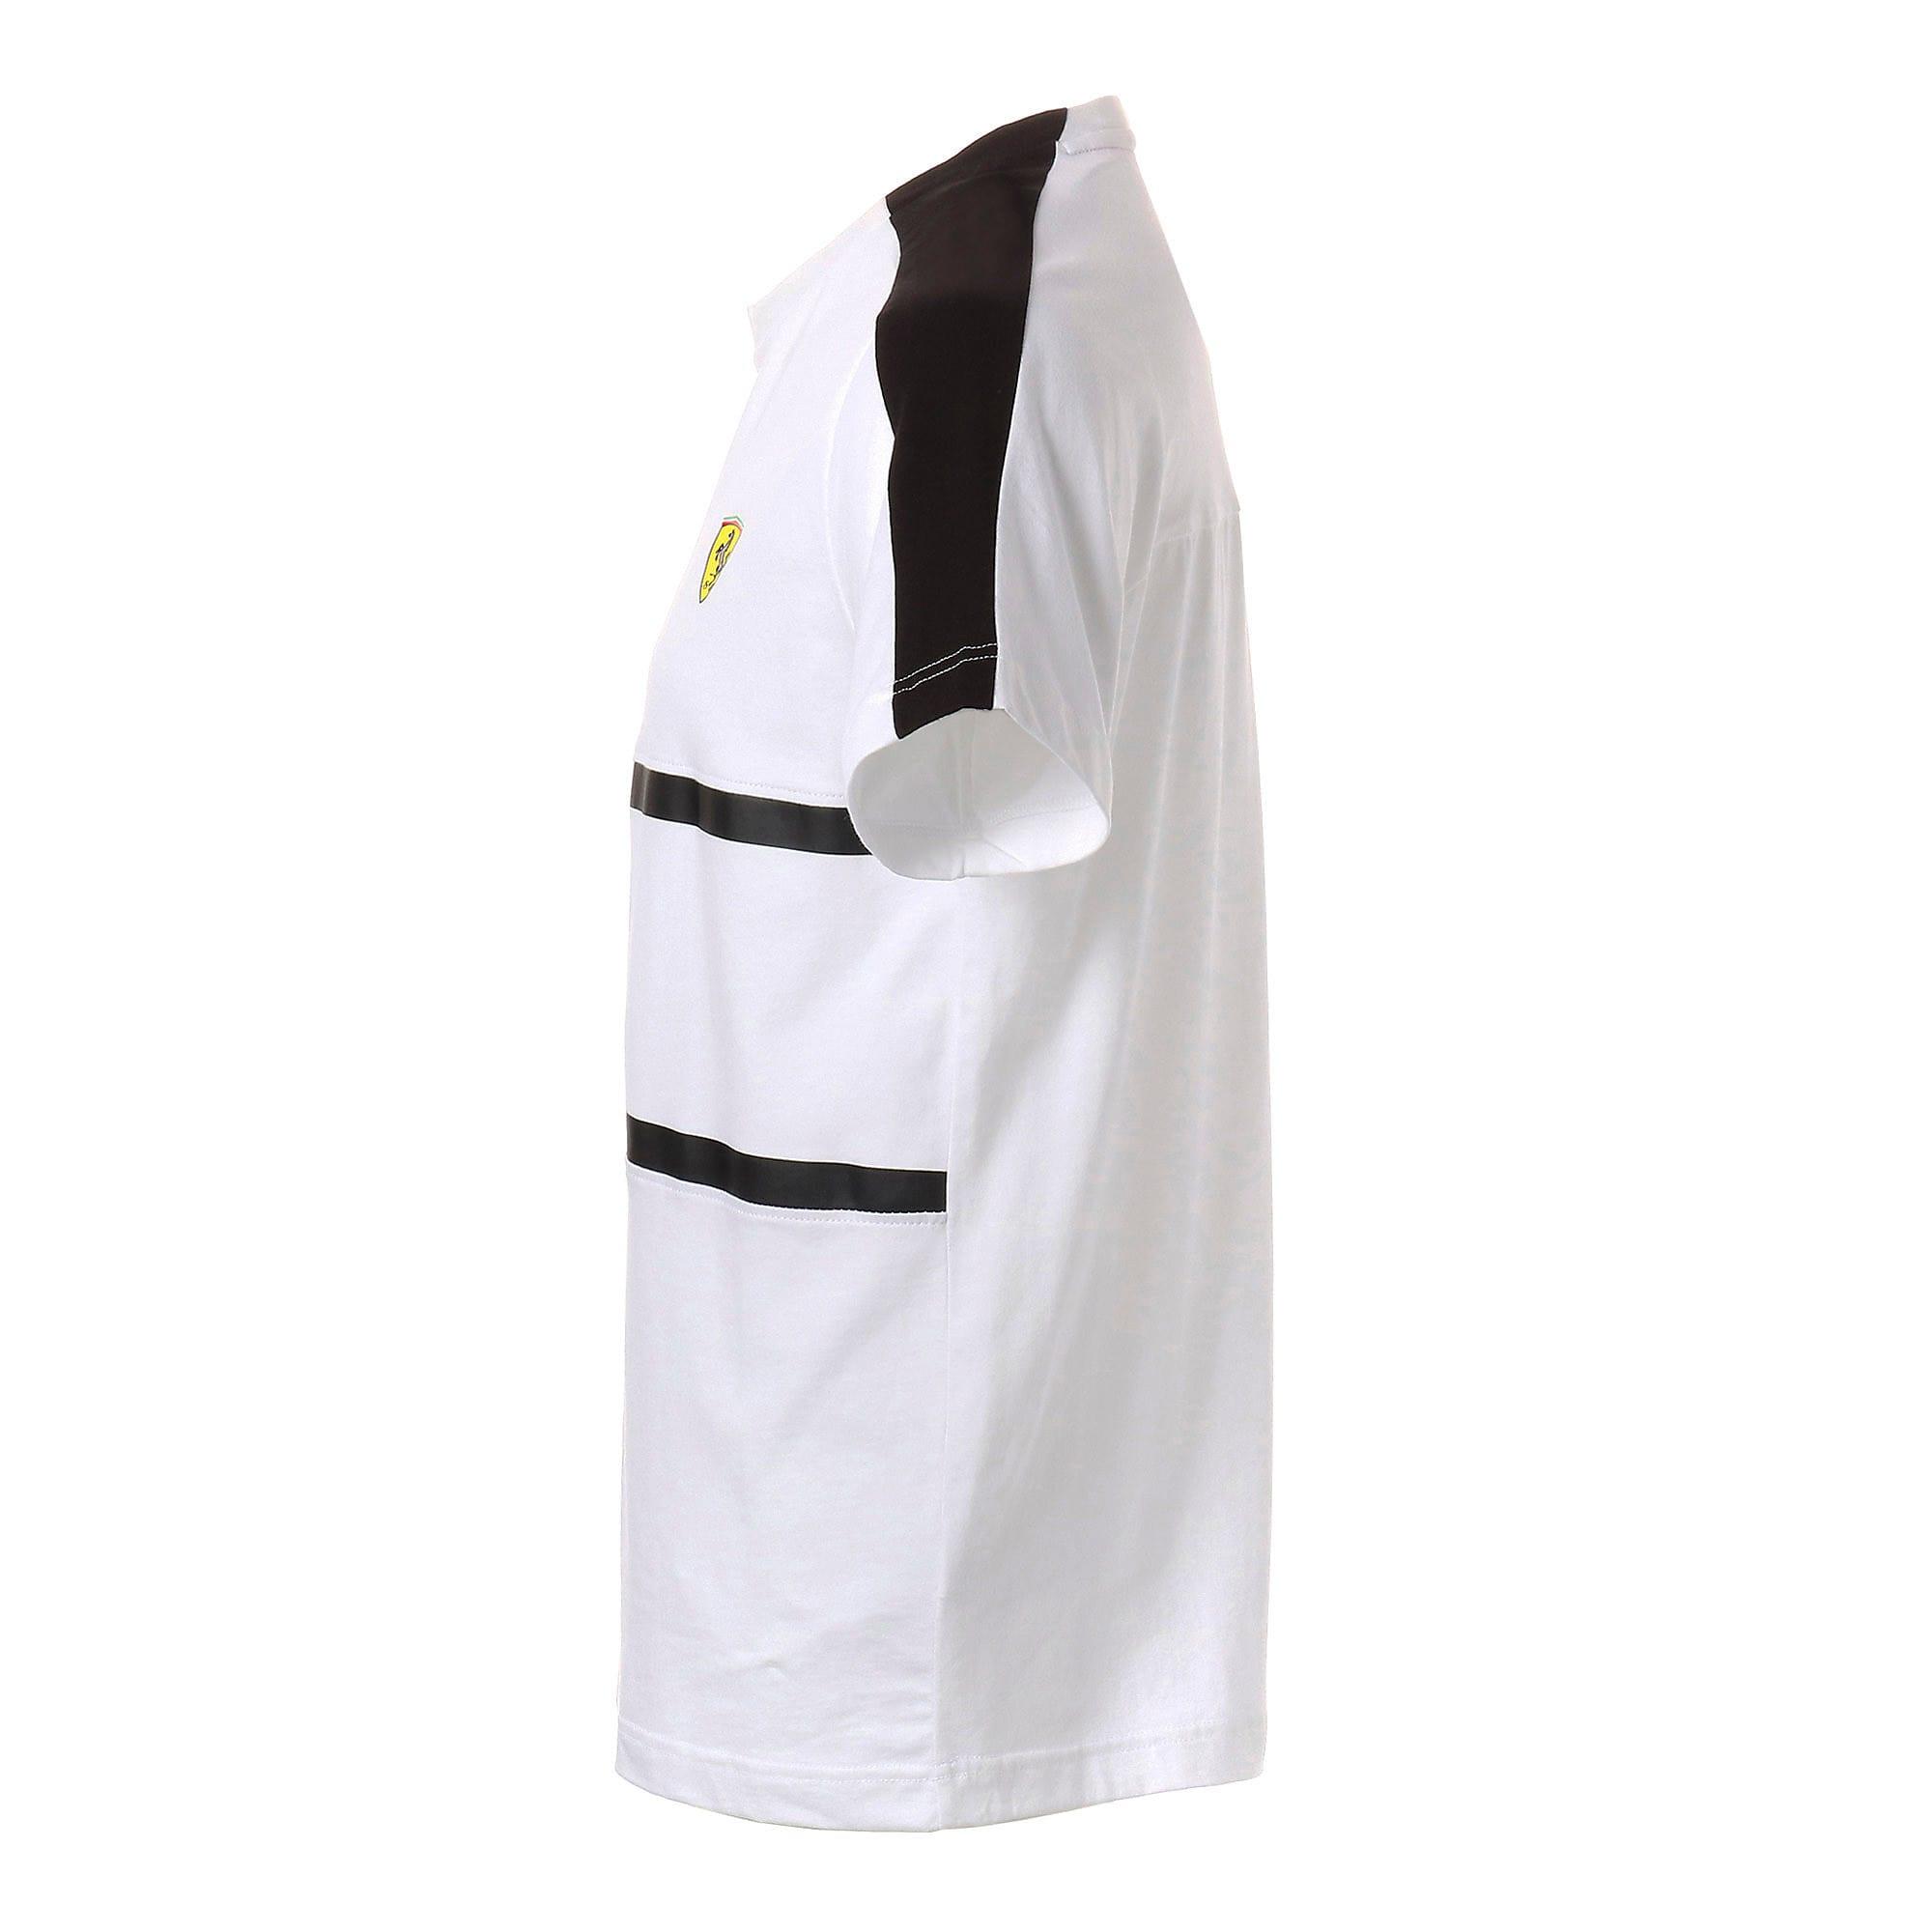 Thumbnail 7 of フェラーリ T7 Tシャツ, Puma White, medium-JPN